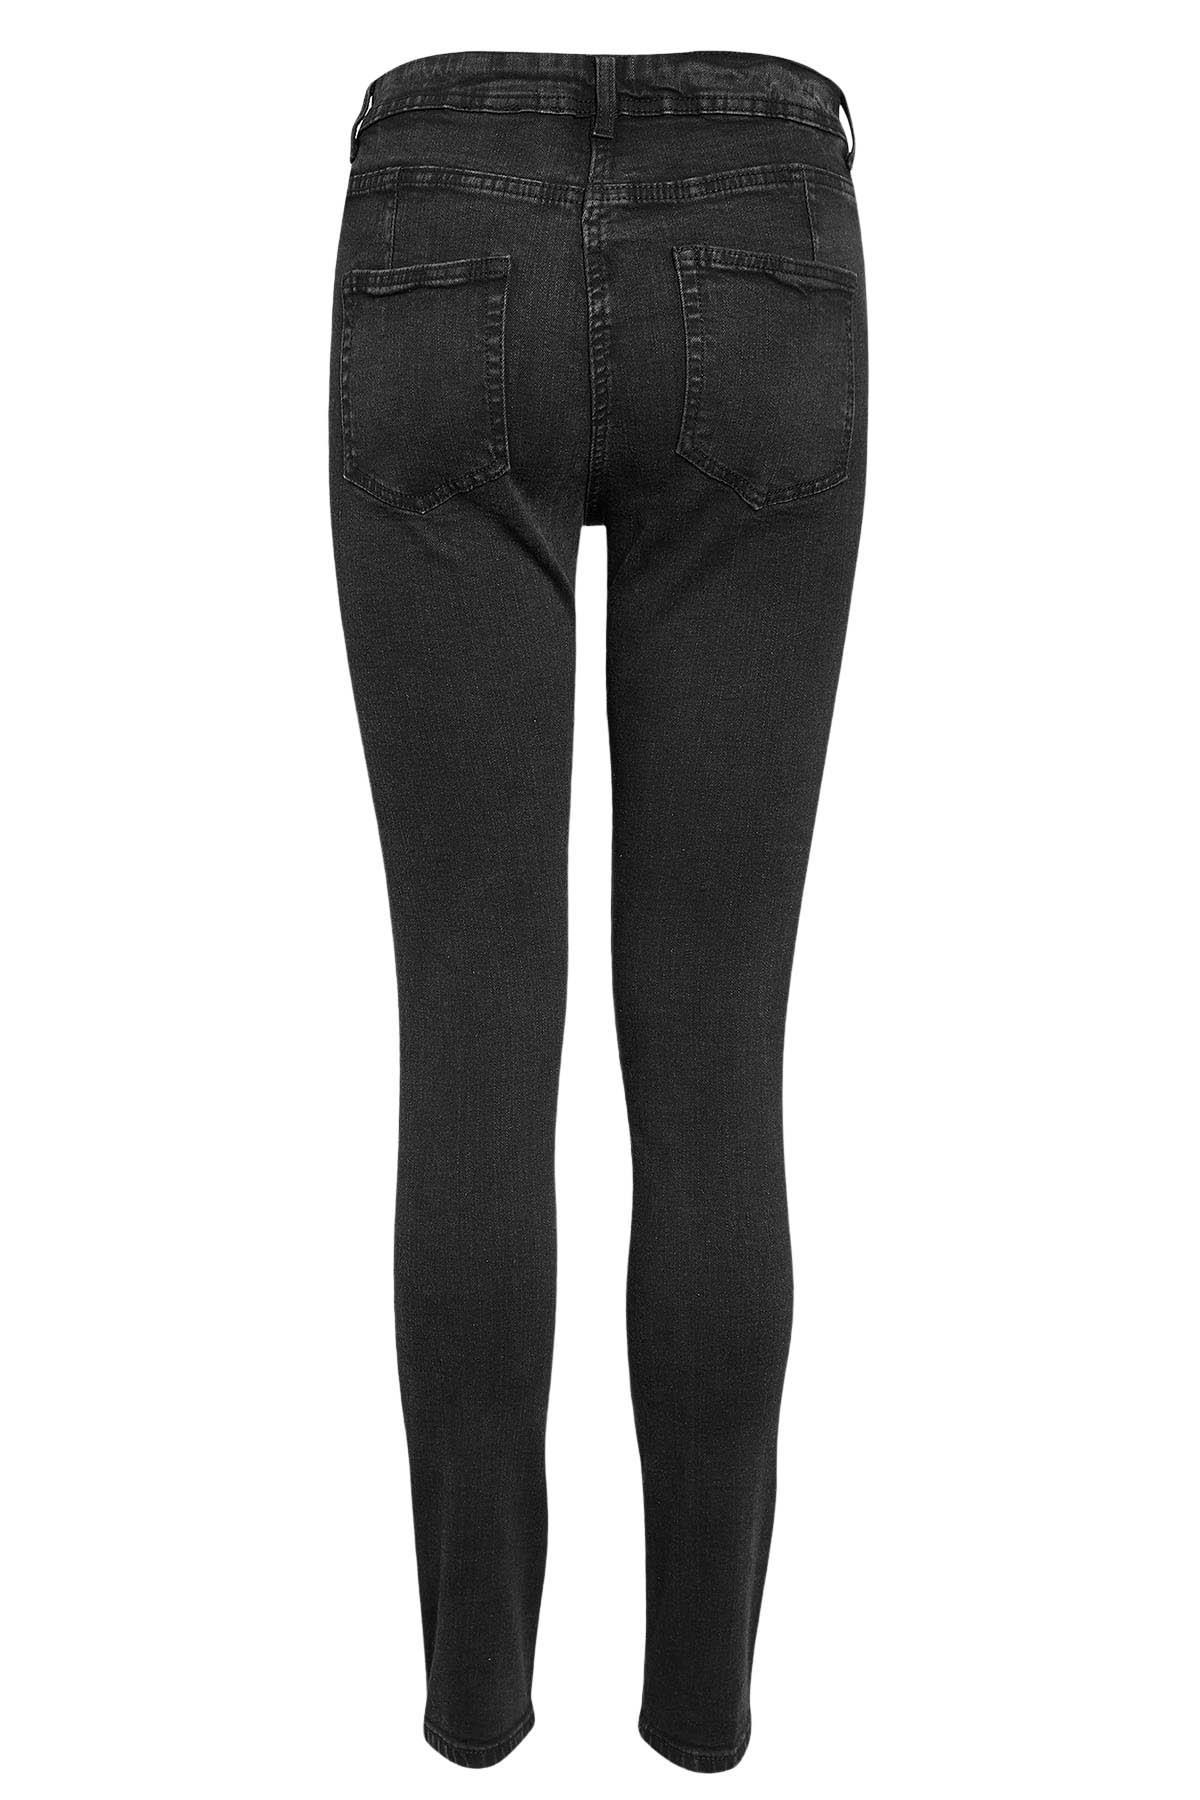 Ladies-Skinny-Jeans-New-ex-Next-Extra-Stretch-Size-6-18-Short-Reg-X-Long-Tall thumbnail 9